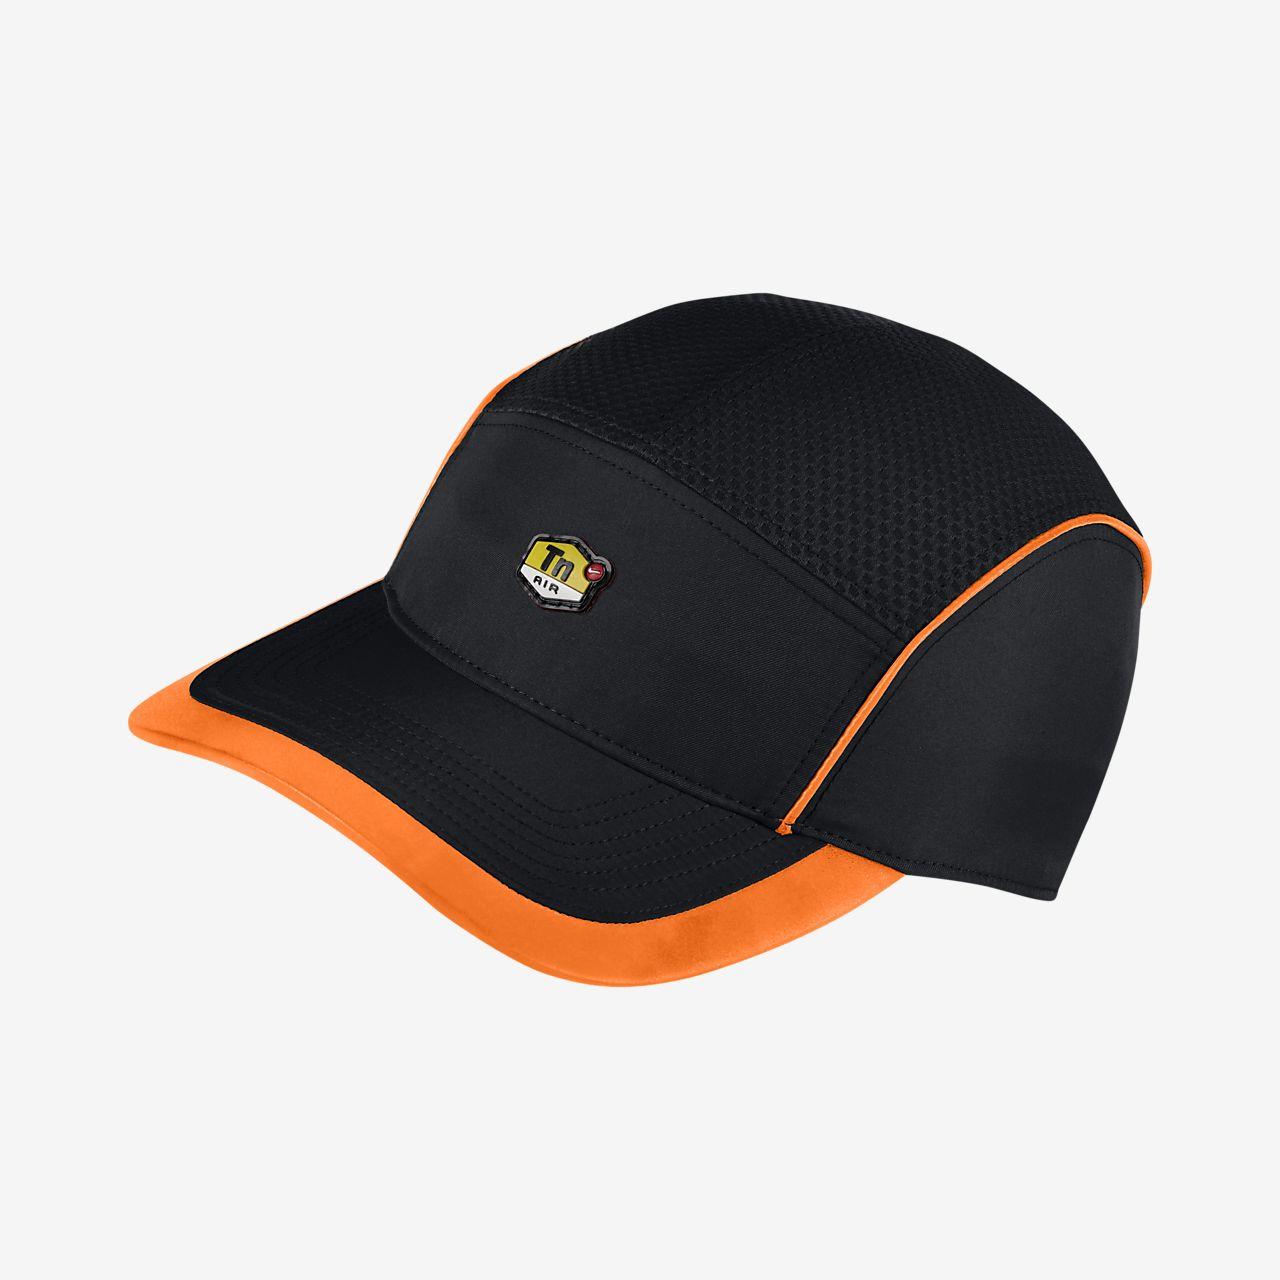 ee40121fbb4 Nike Sportswear TN Air AeroBill AW84 Adjustable Hat. Nike.com